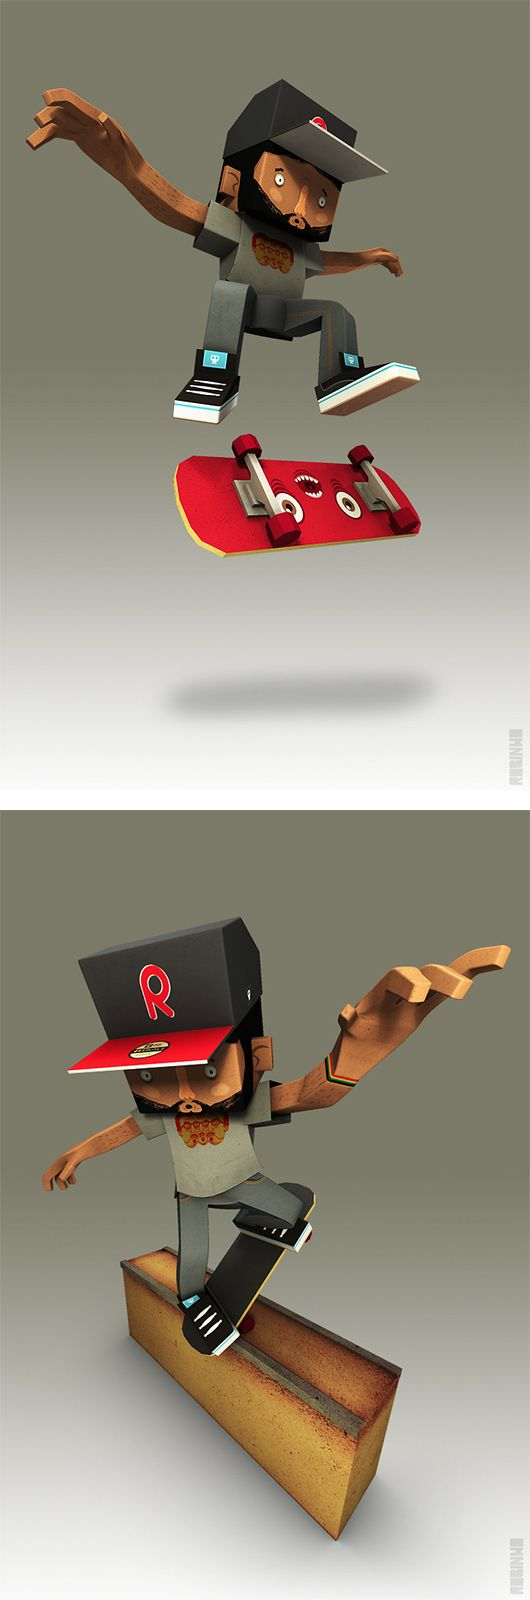 3D Illustrations by Robson Santana da Silva